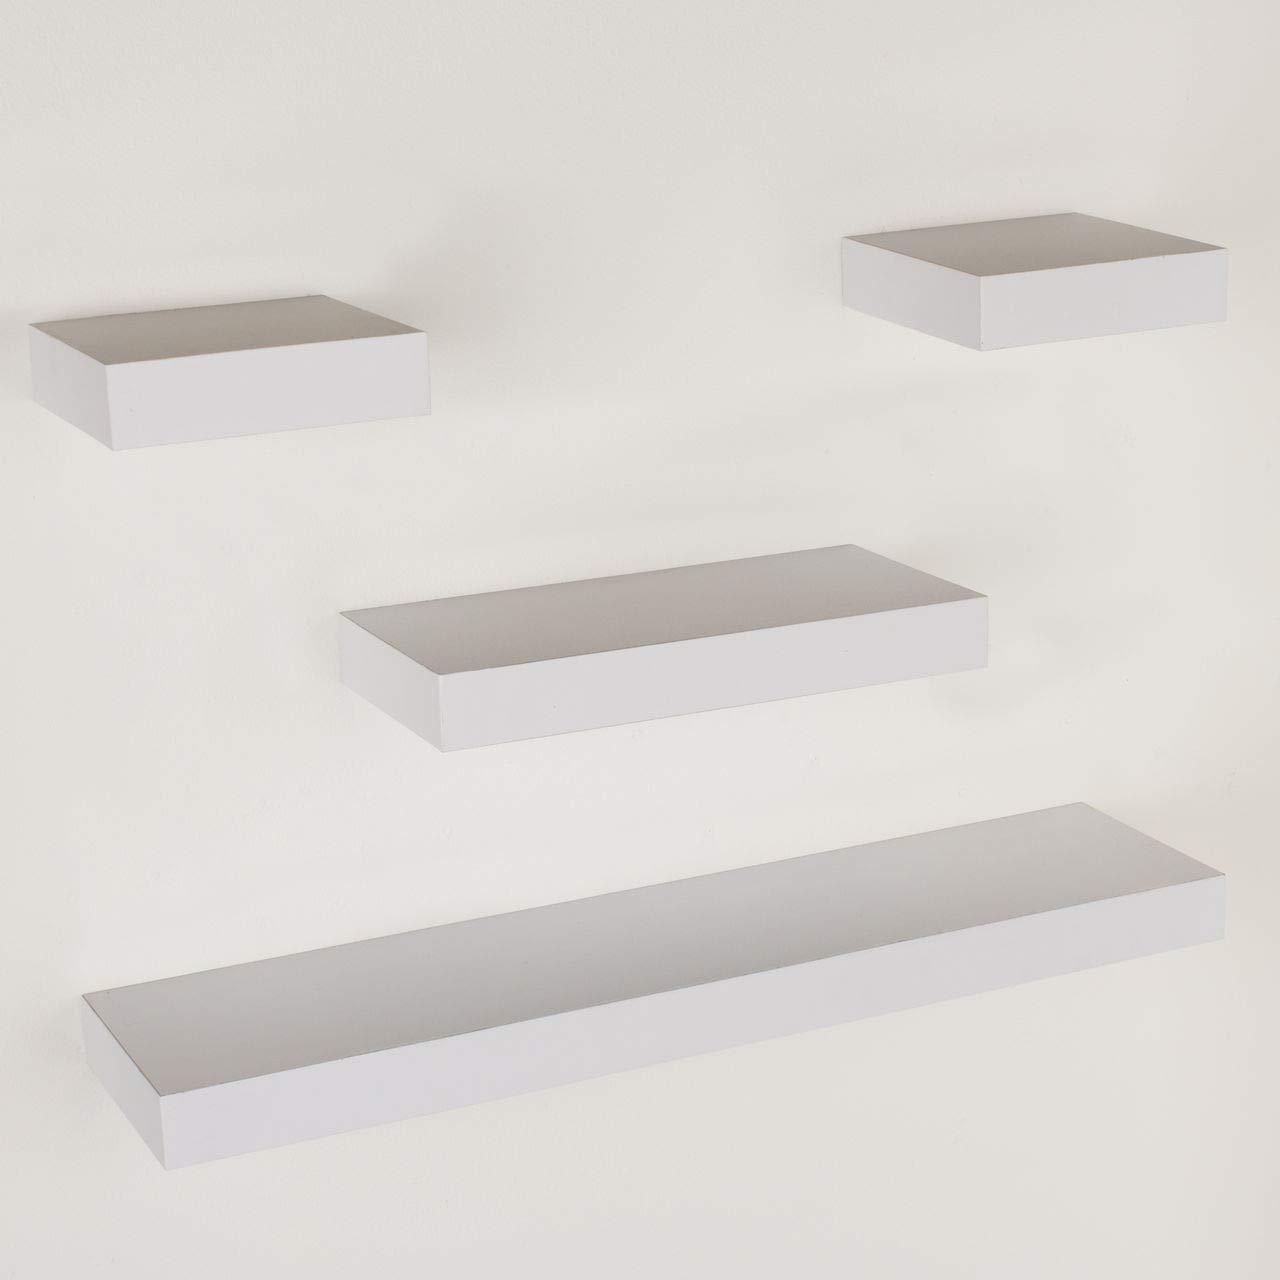 Design Vicenza Enna Sets Shelving 4 pcs narrow hudson floating shelf pack - matt White